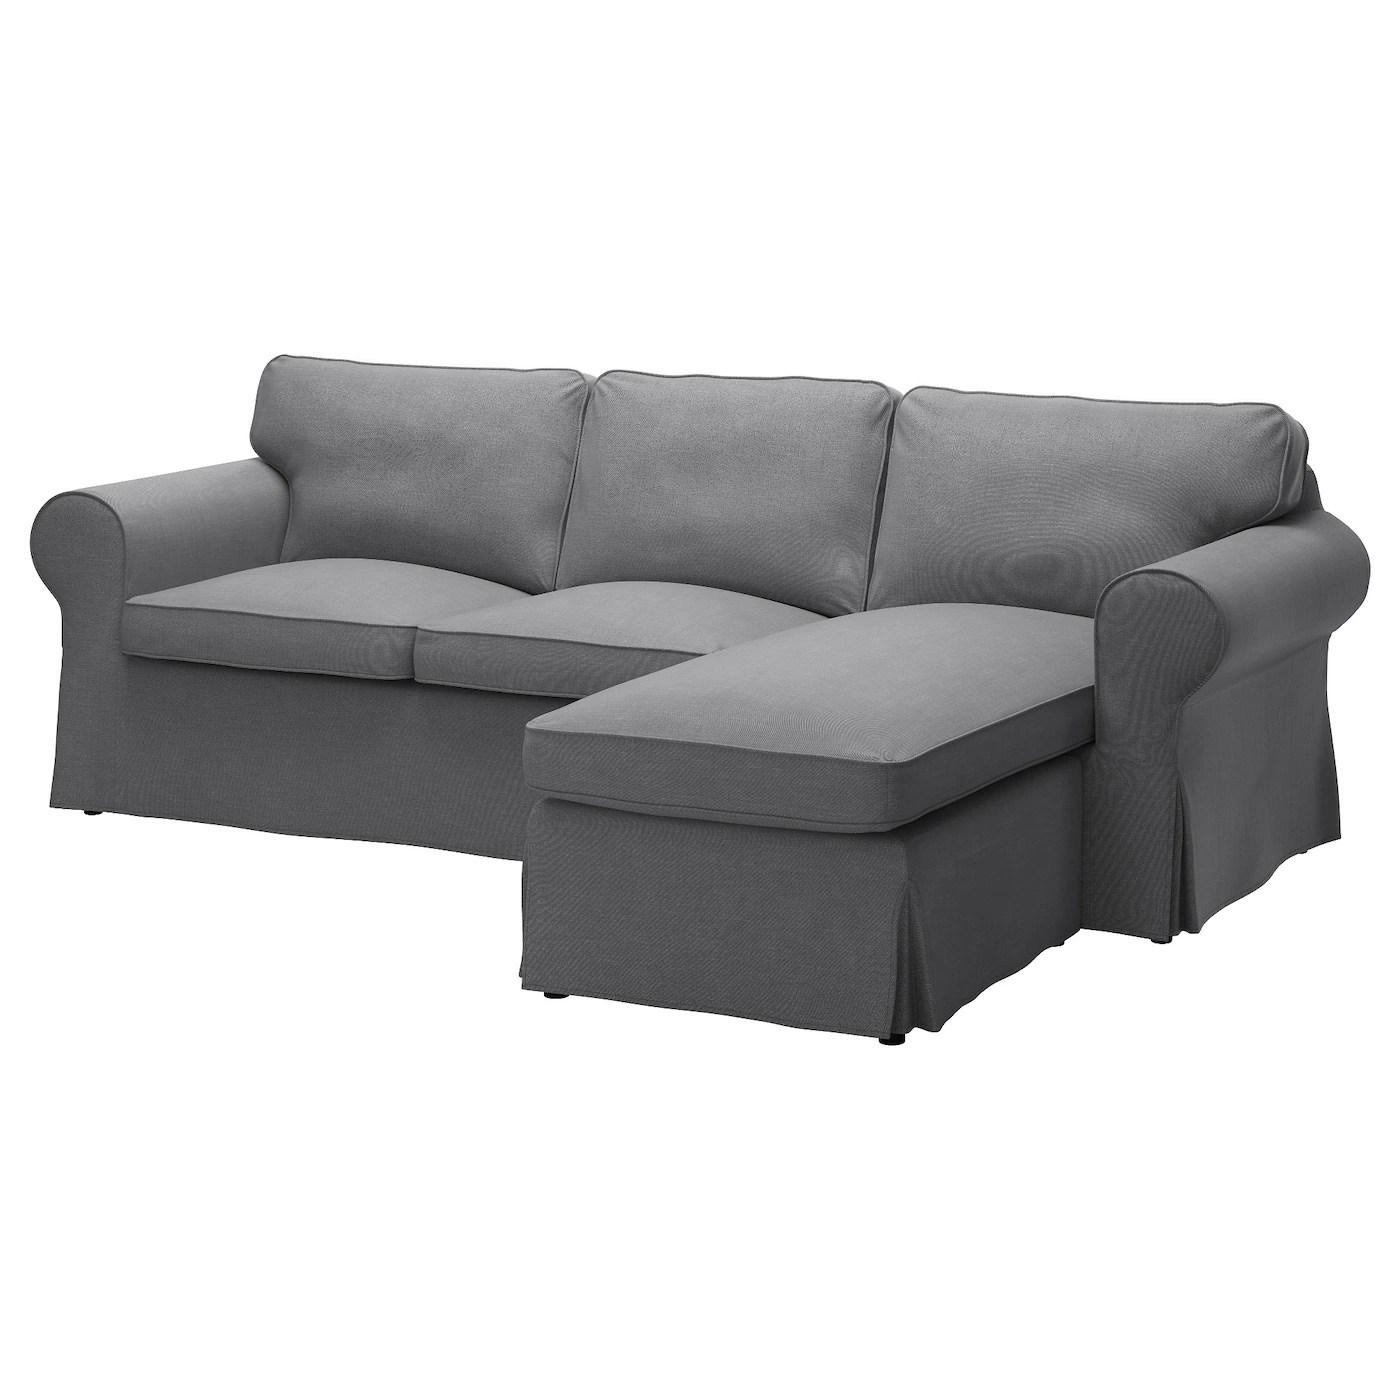 dark grey sofa cover mart ingram road san antonio tx ektorp two seat w chaise longue nordvalla